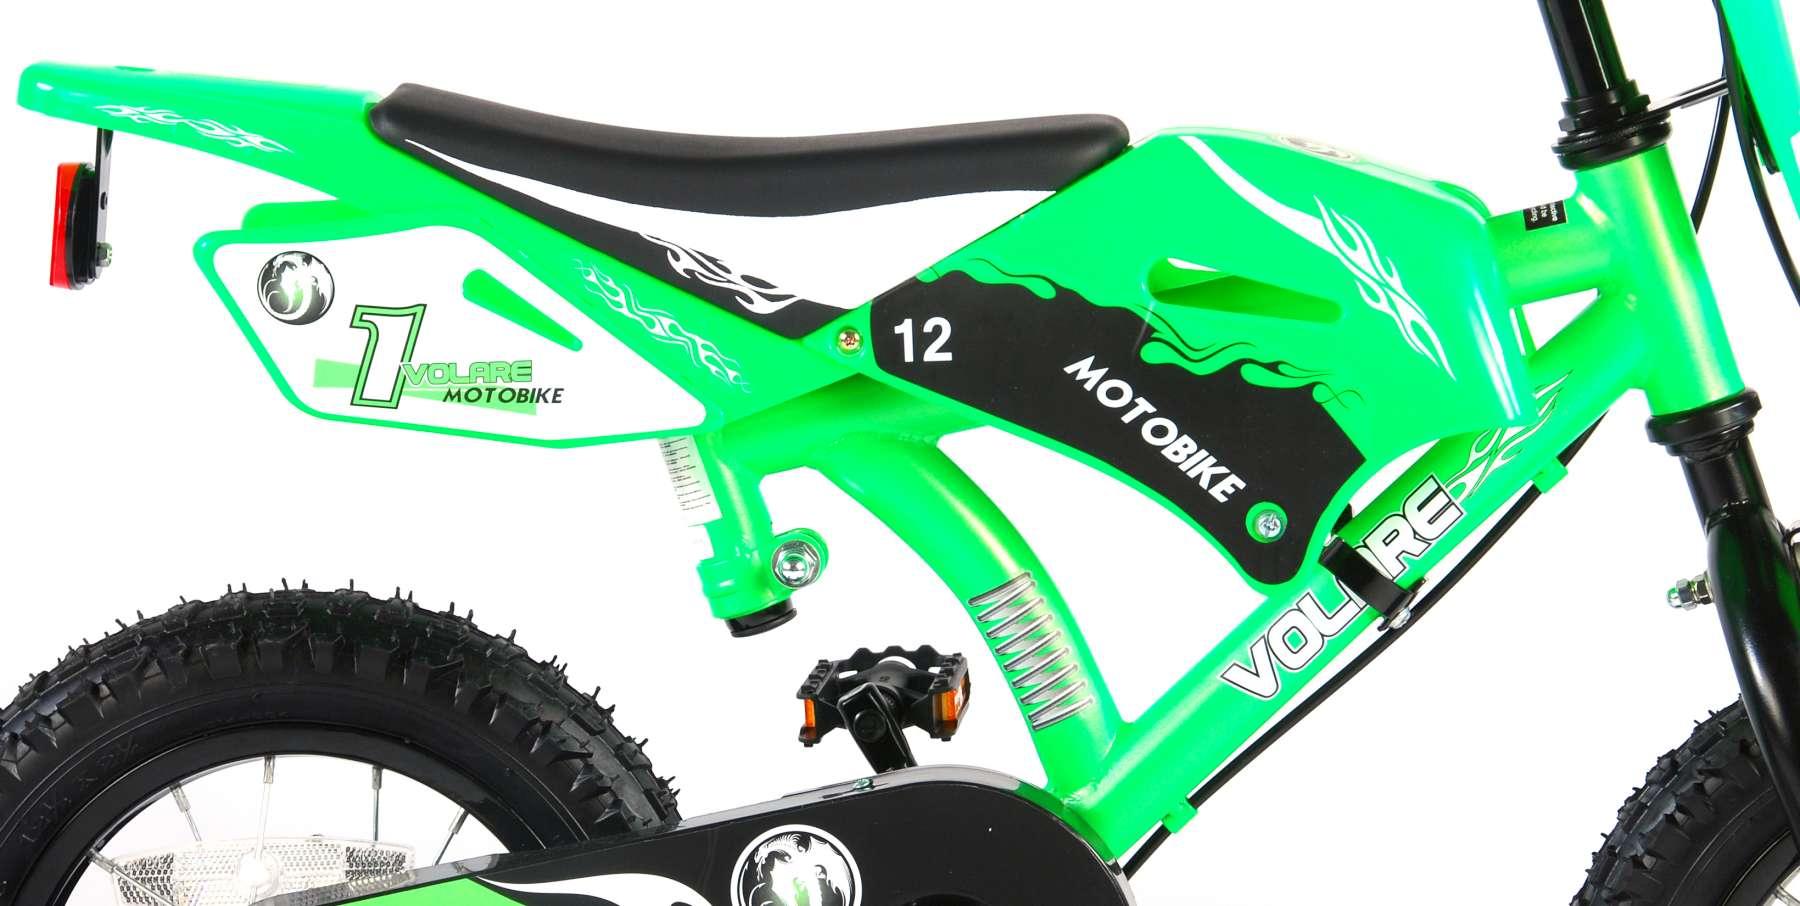 Bicicleta Motorbike de 12 pulgadas Verde - estructura